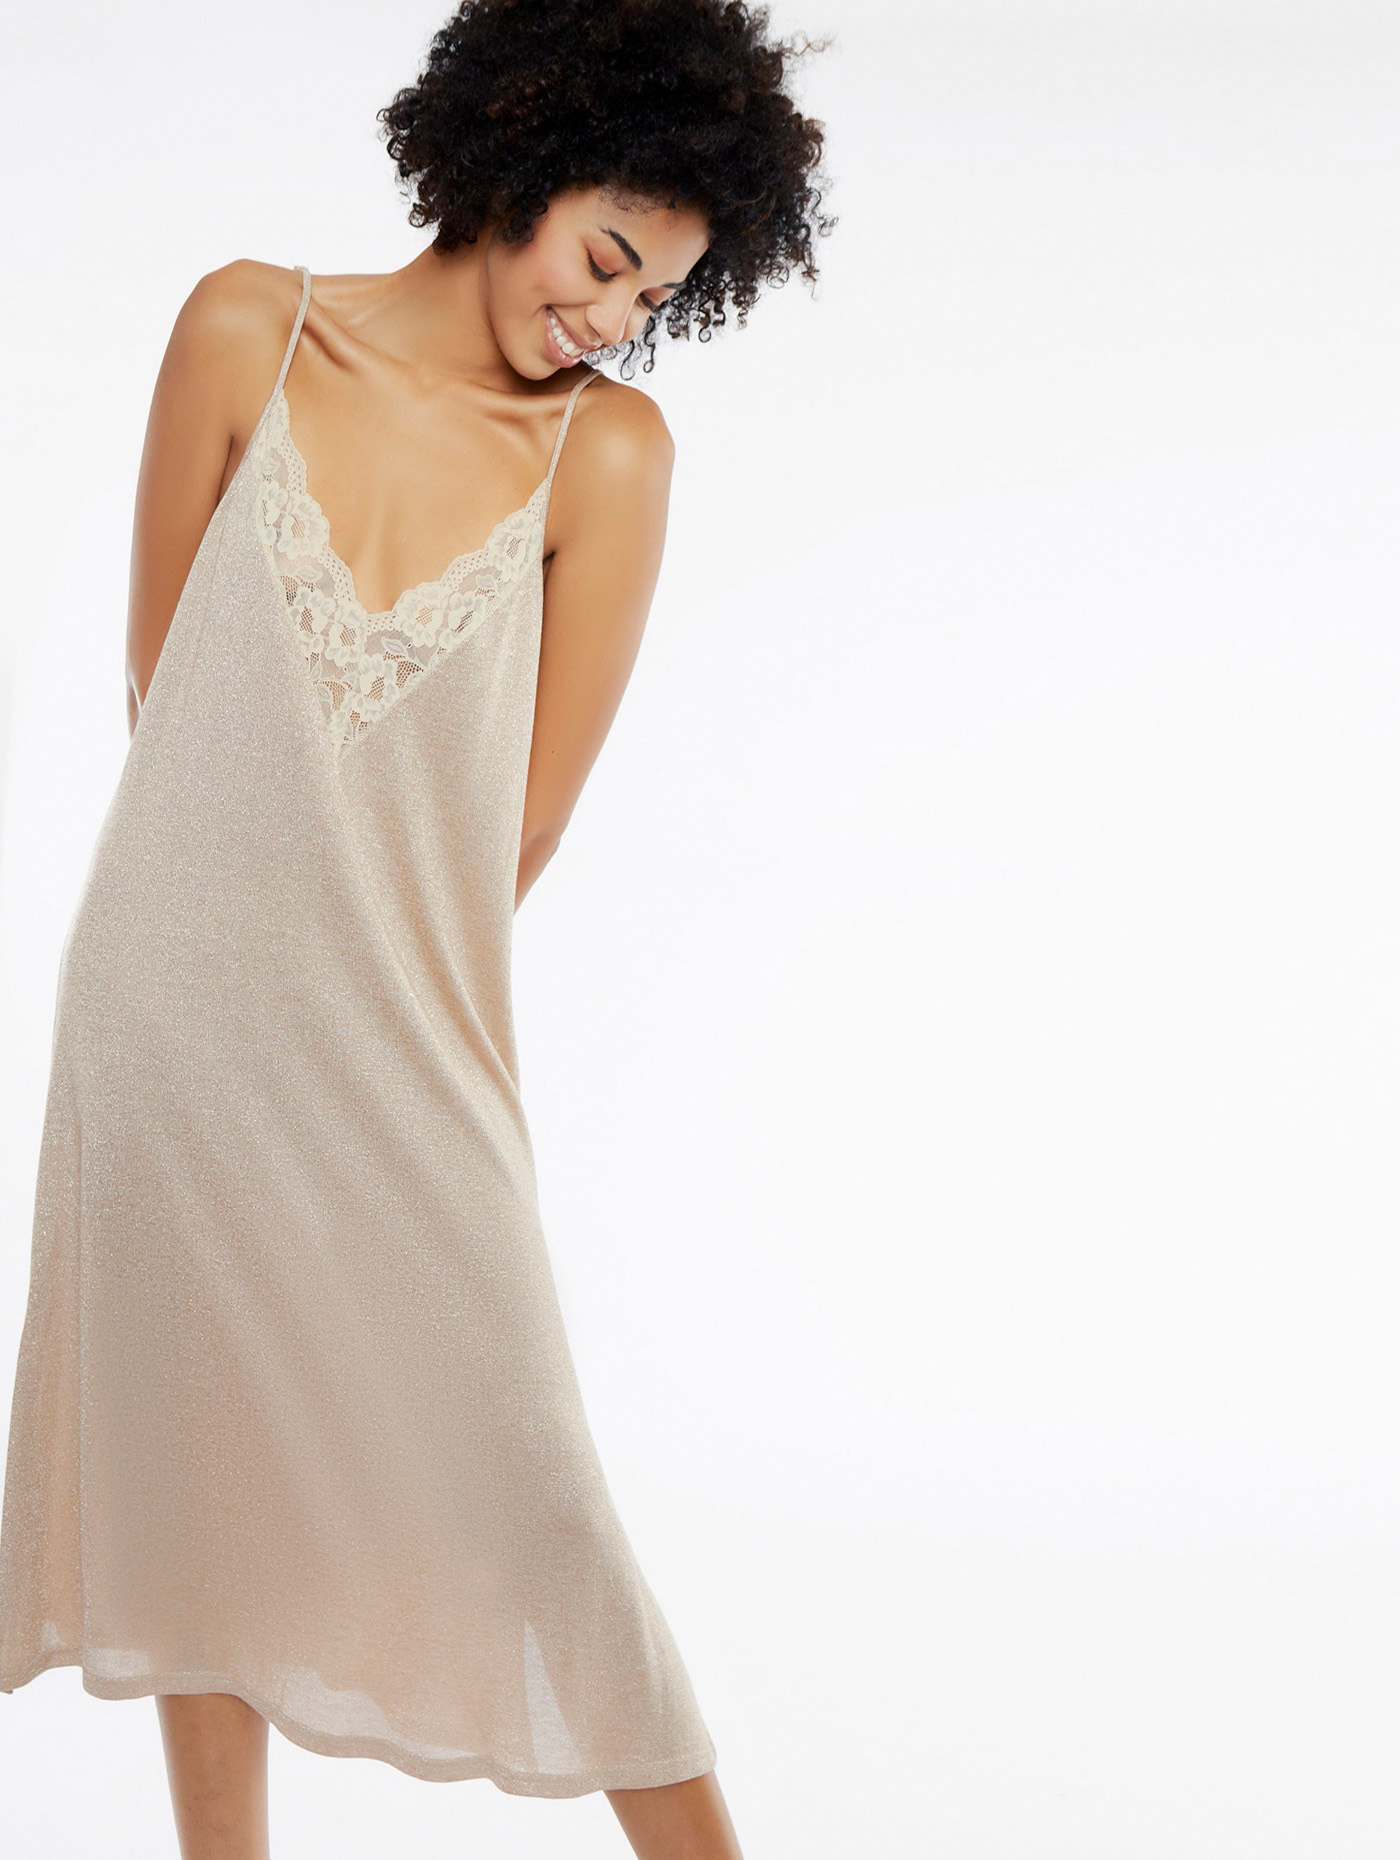 Jurk midi v-neck dress rose-4